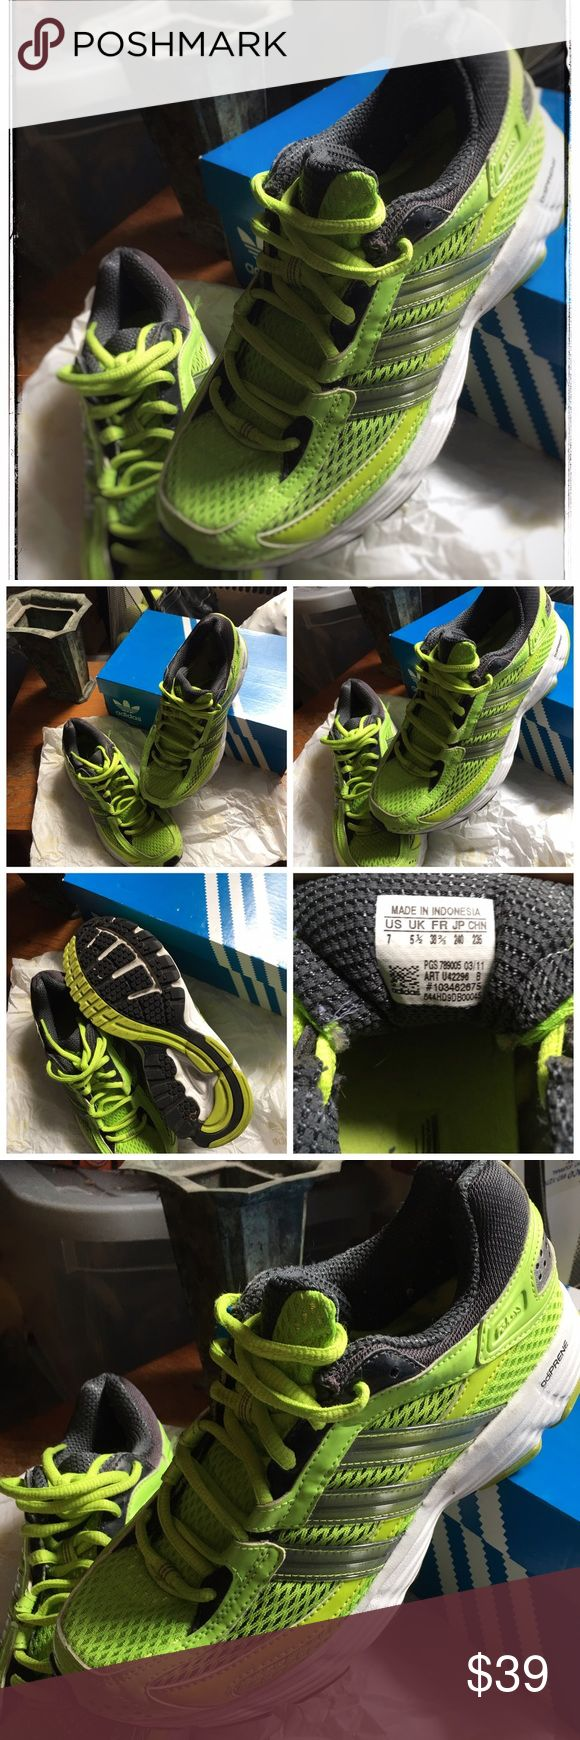 adidas adiPRENE adidas adiPRENE size woman size 7 in a neon green color. adidas Shoes Sneakers